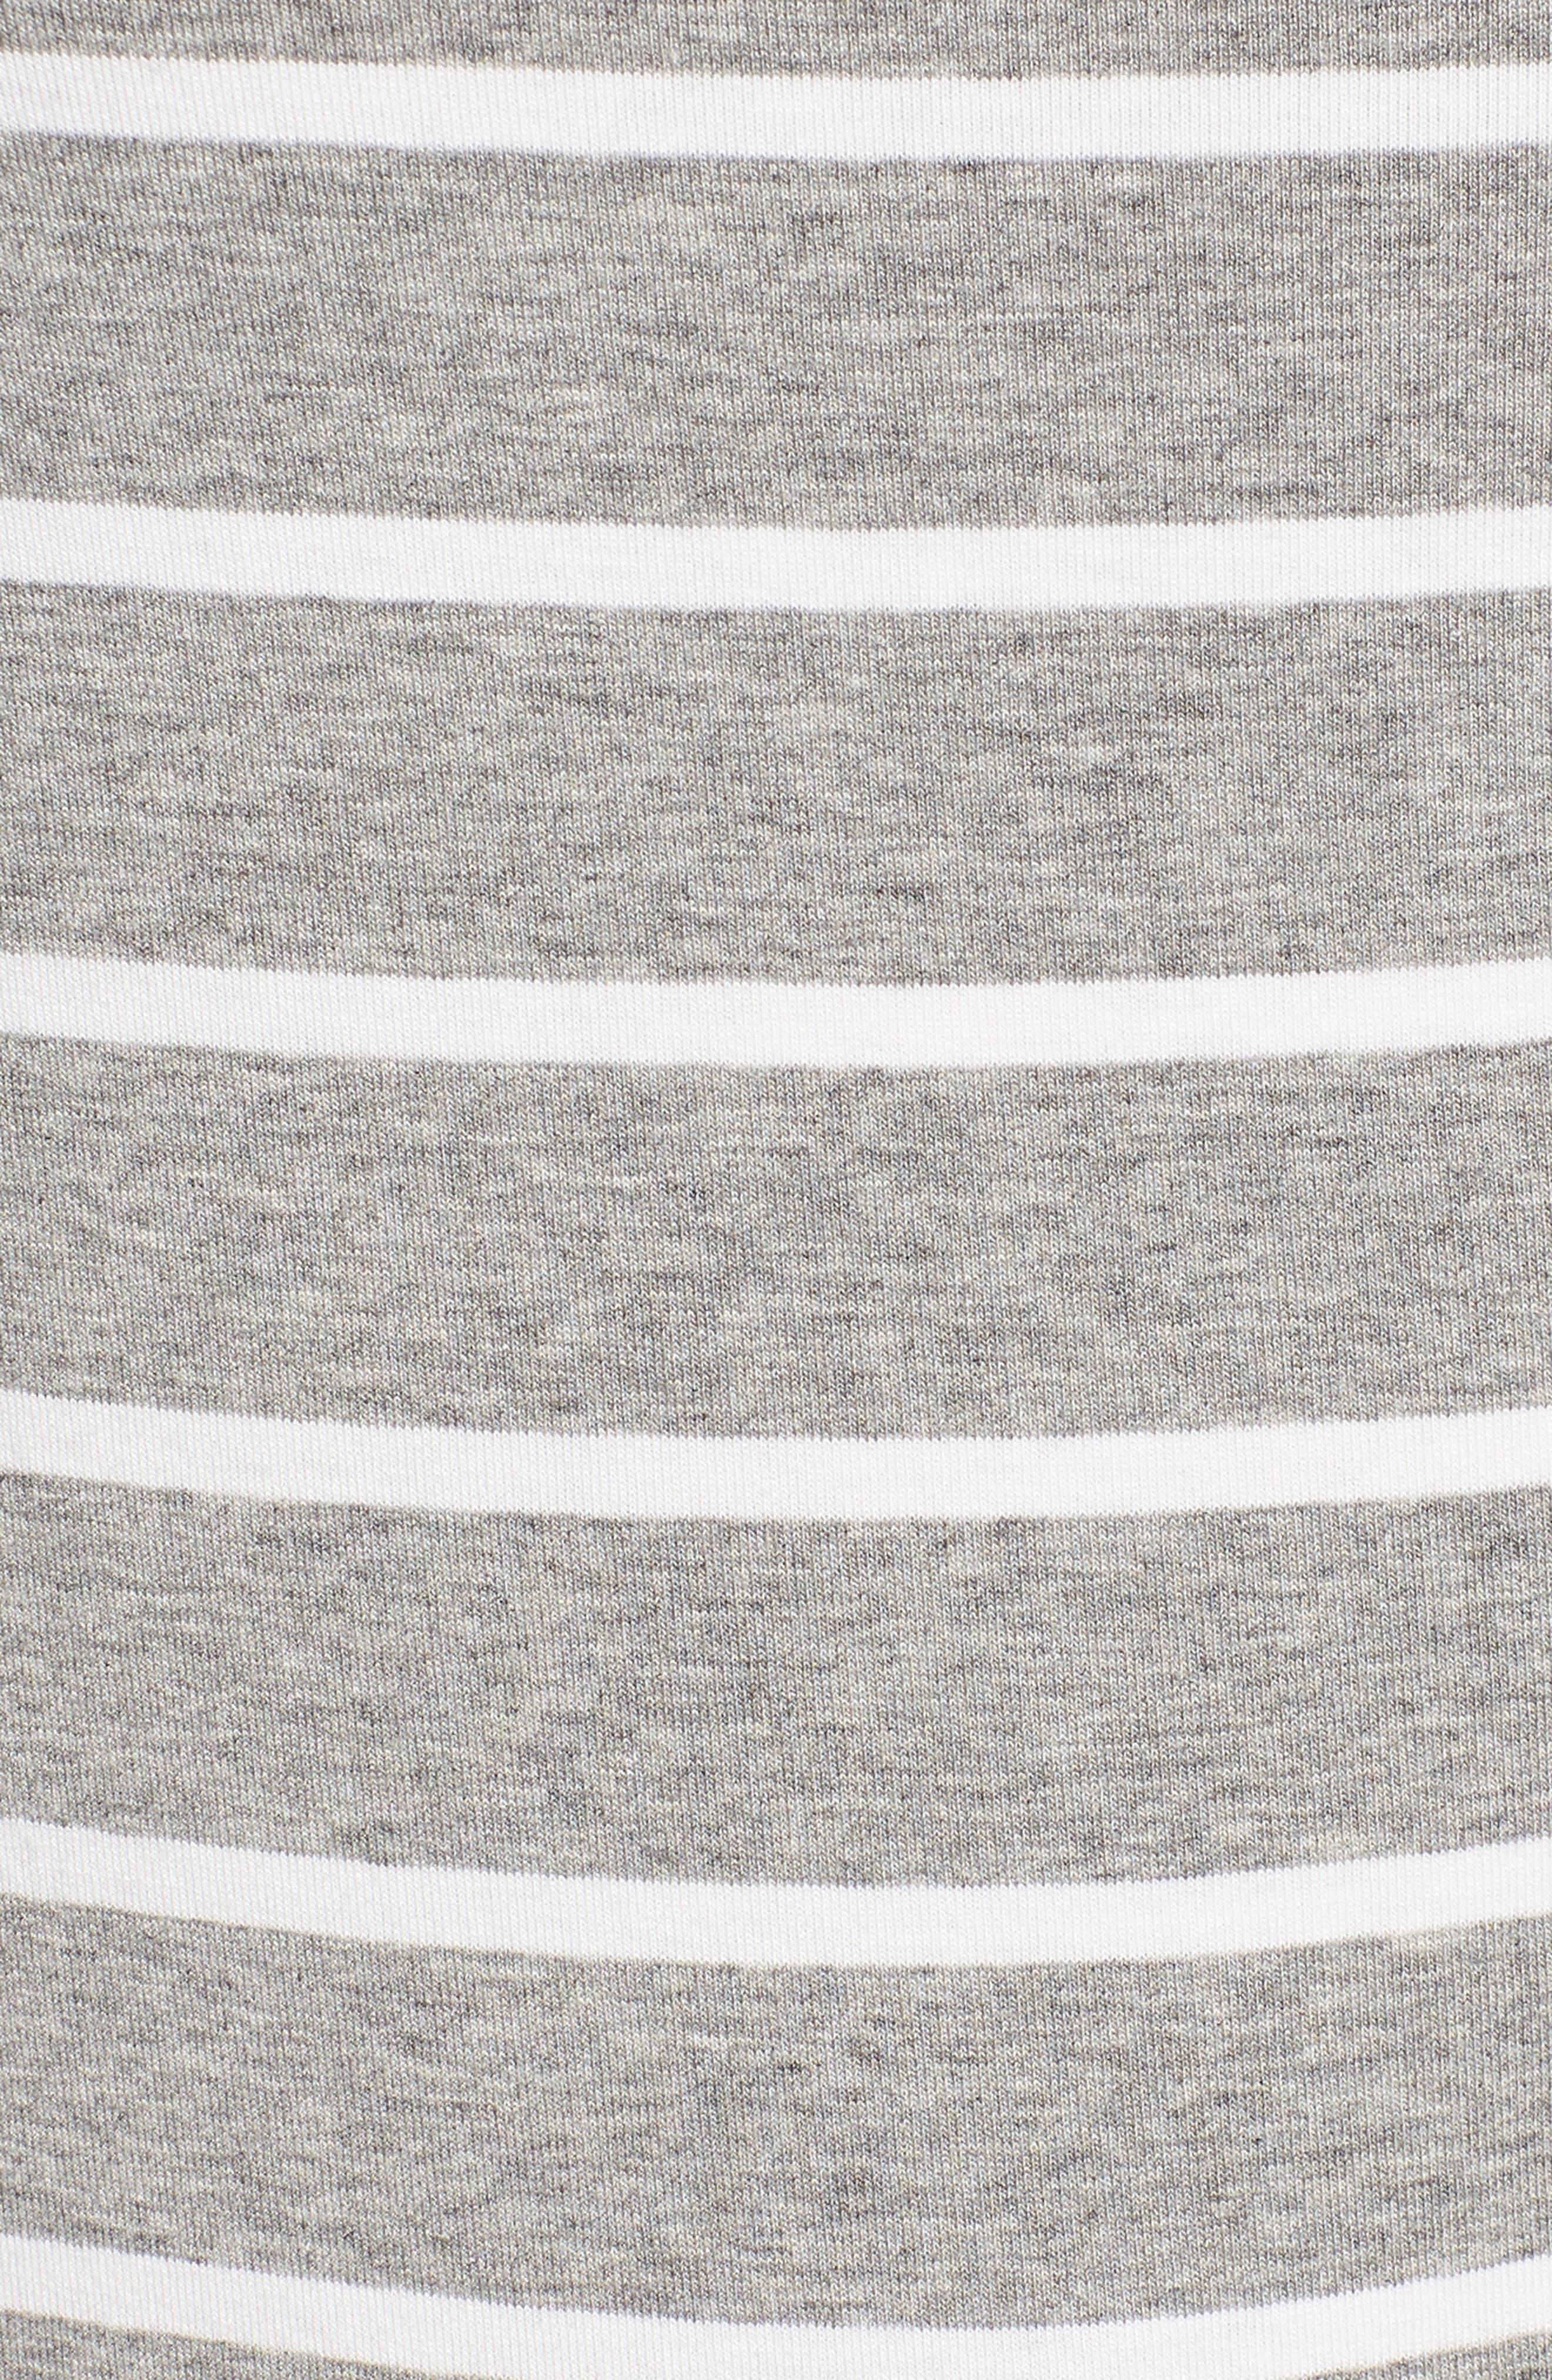 Long Sleeve Bateau Neck Tee,                             Alternate thumbnail 5, color,                             Grey Heather- Ivory Stripe